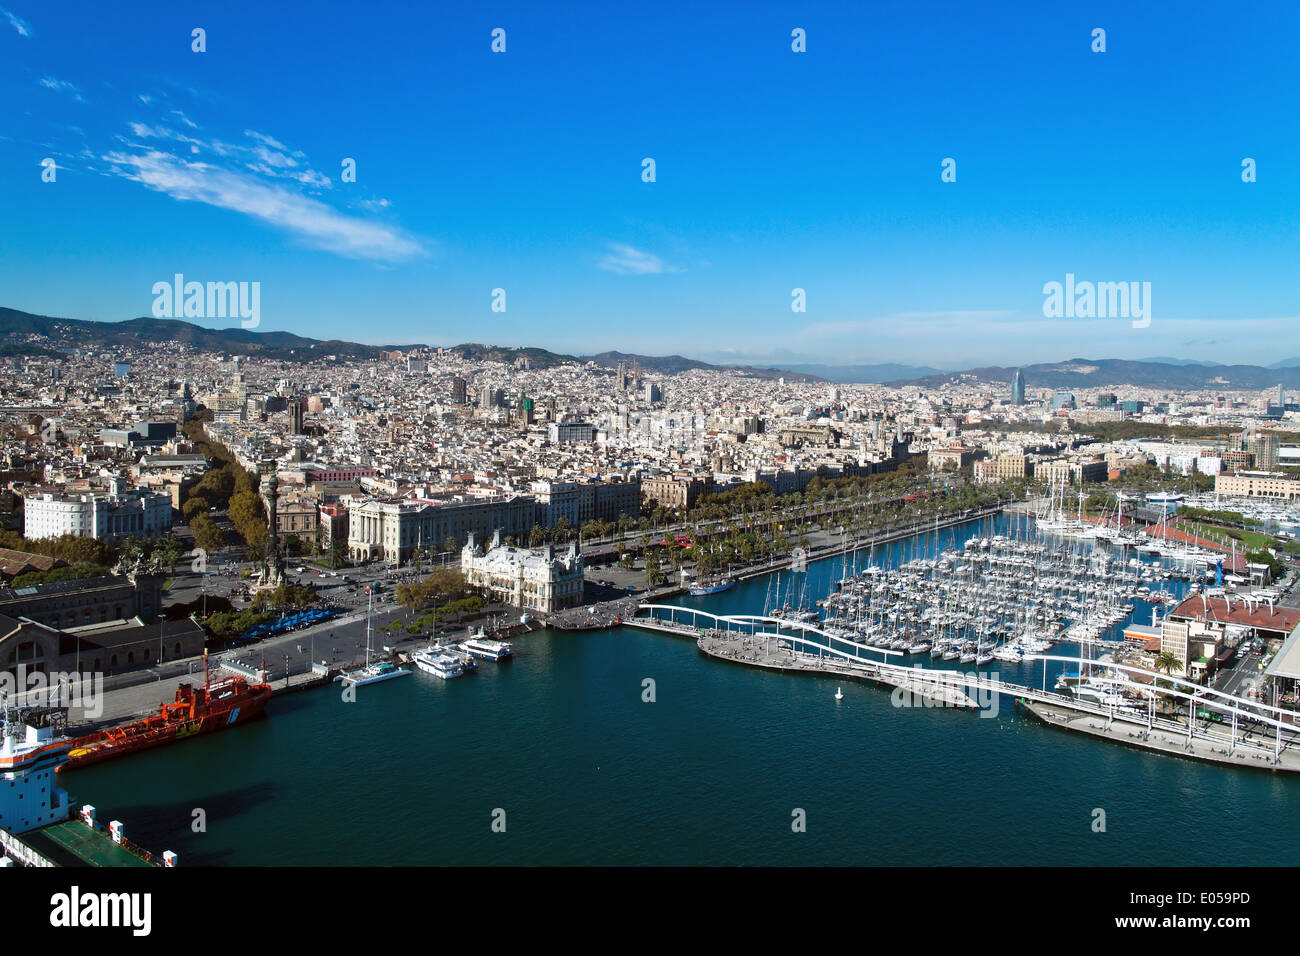 Spain - Barcelona - overview, Spanien - Barcelona - uebersicht - Stock Image